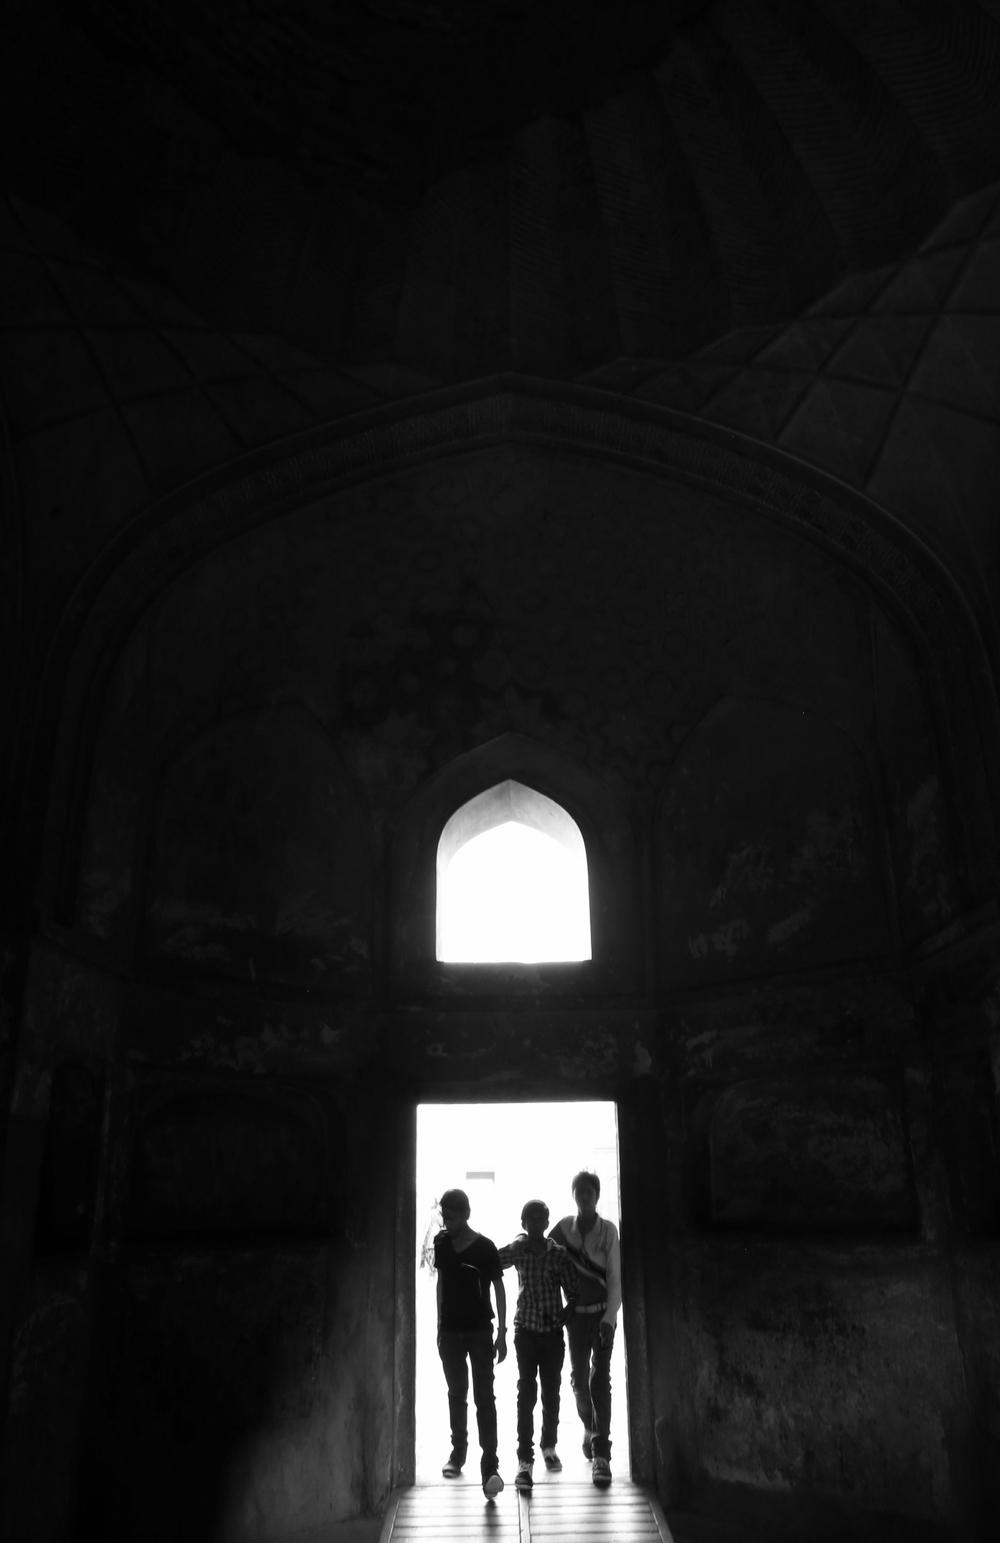 Teens - Elephanta Island, Mumbai, India